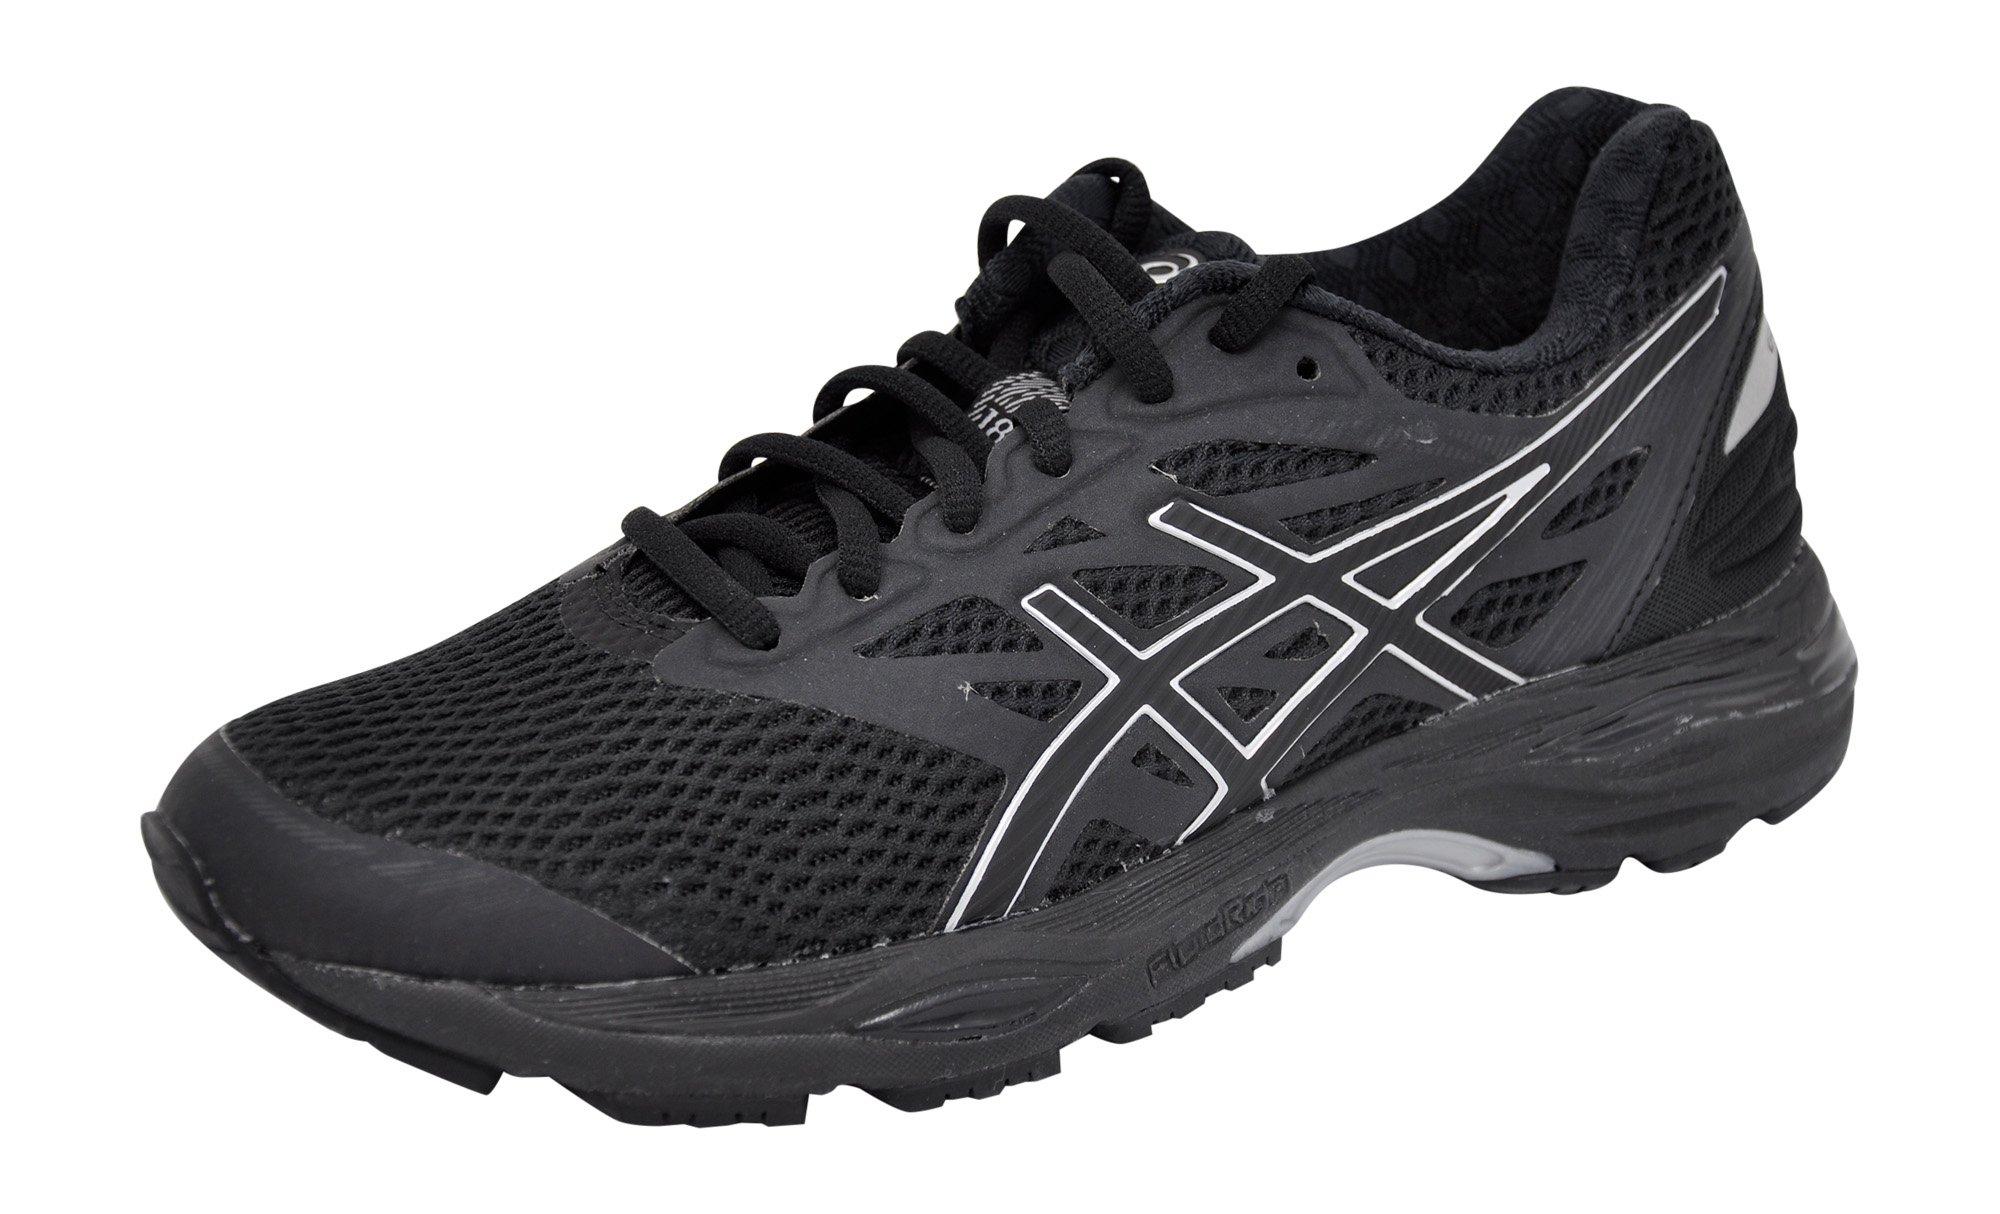 ASICS Women's Gel-Cumulus 18 Running Shoe (8.5 B(M) US, Black/Silver/Black) by ASICS